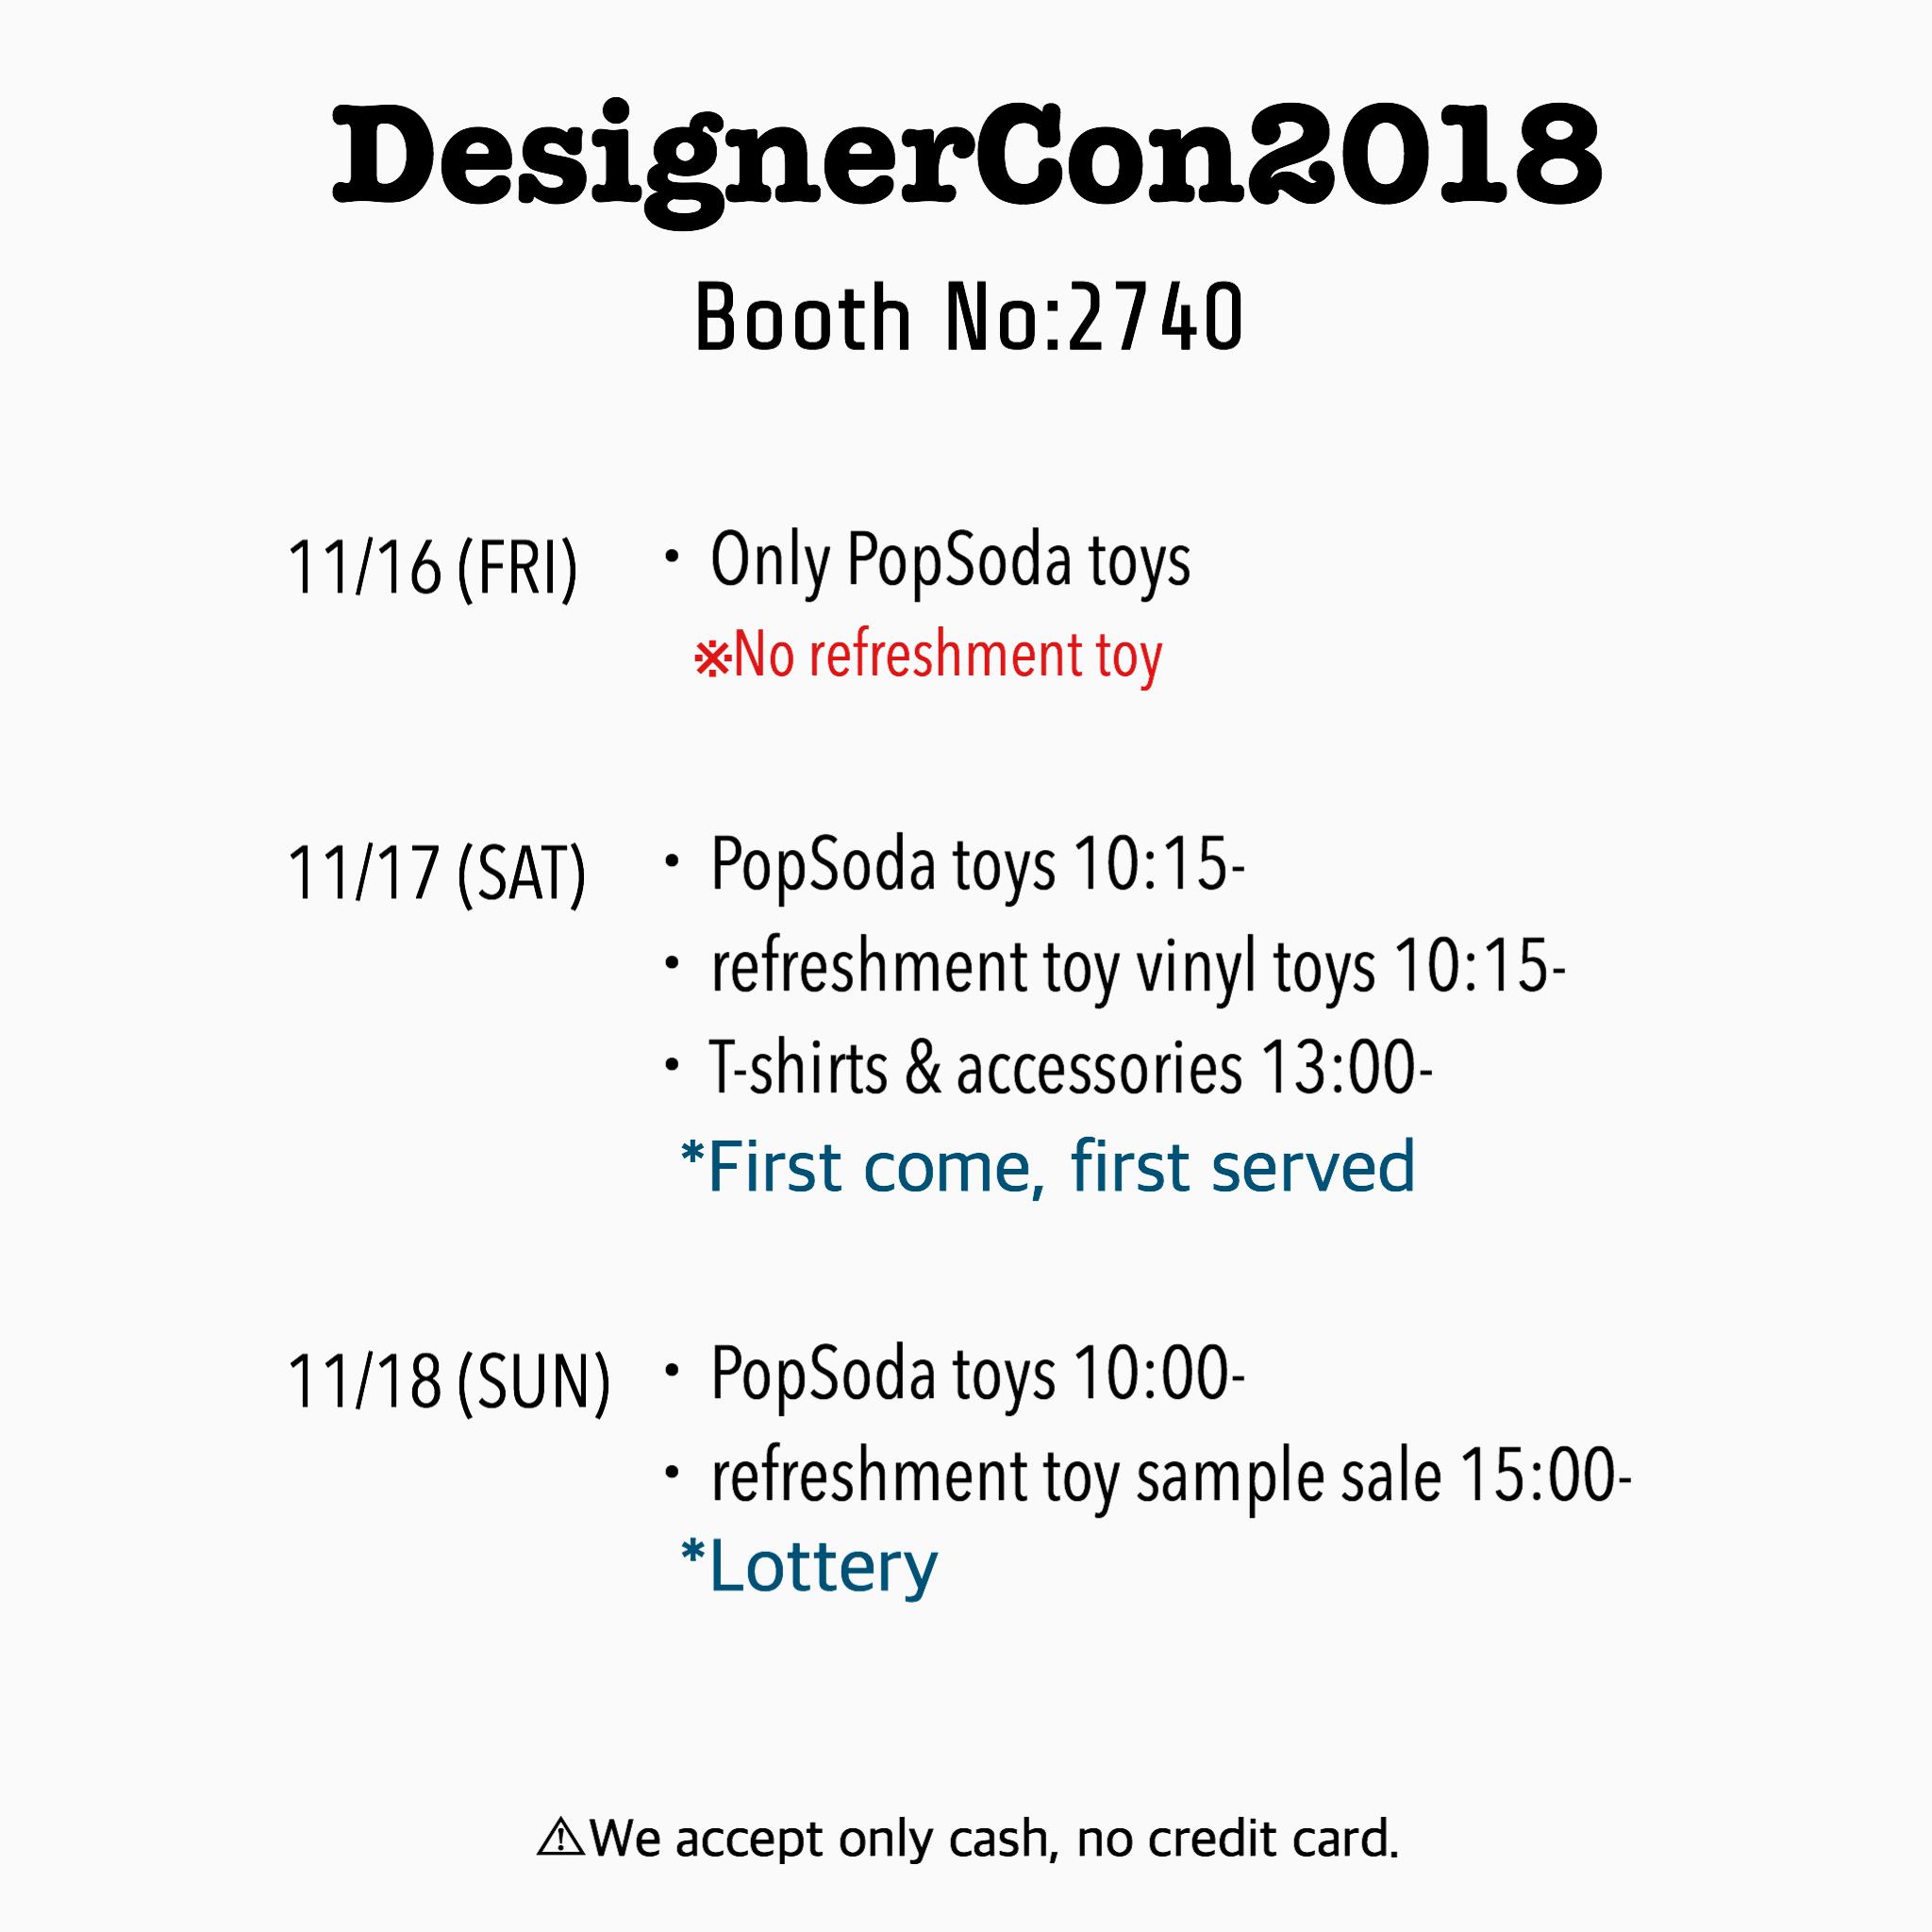 designercon2018_dcon